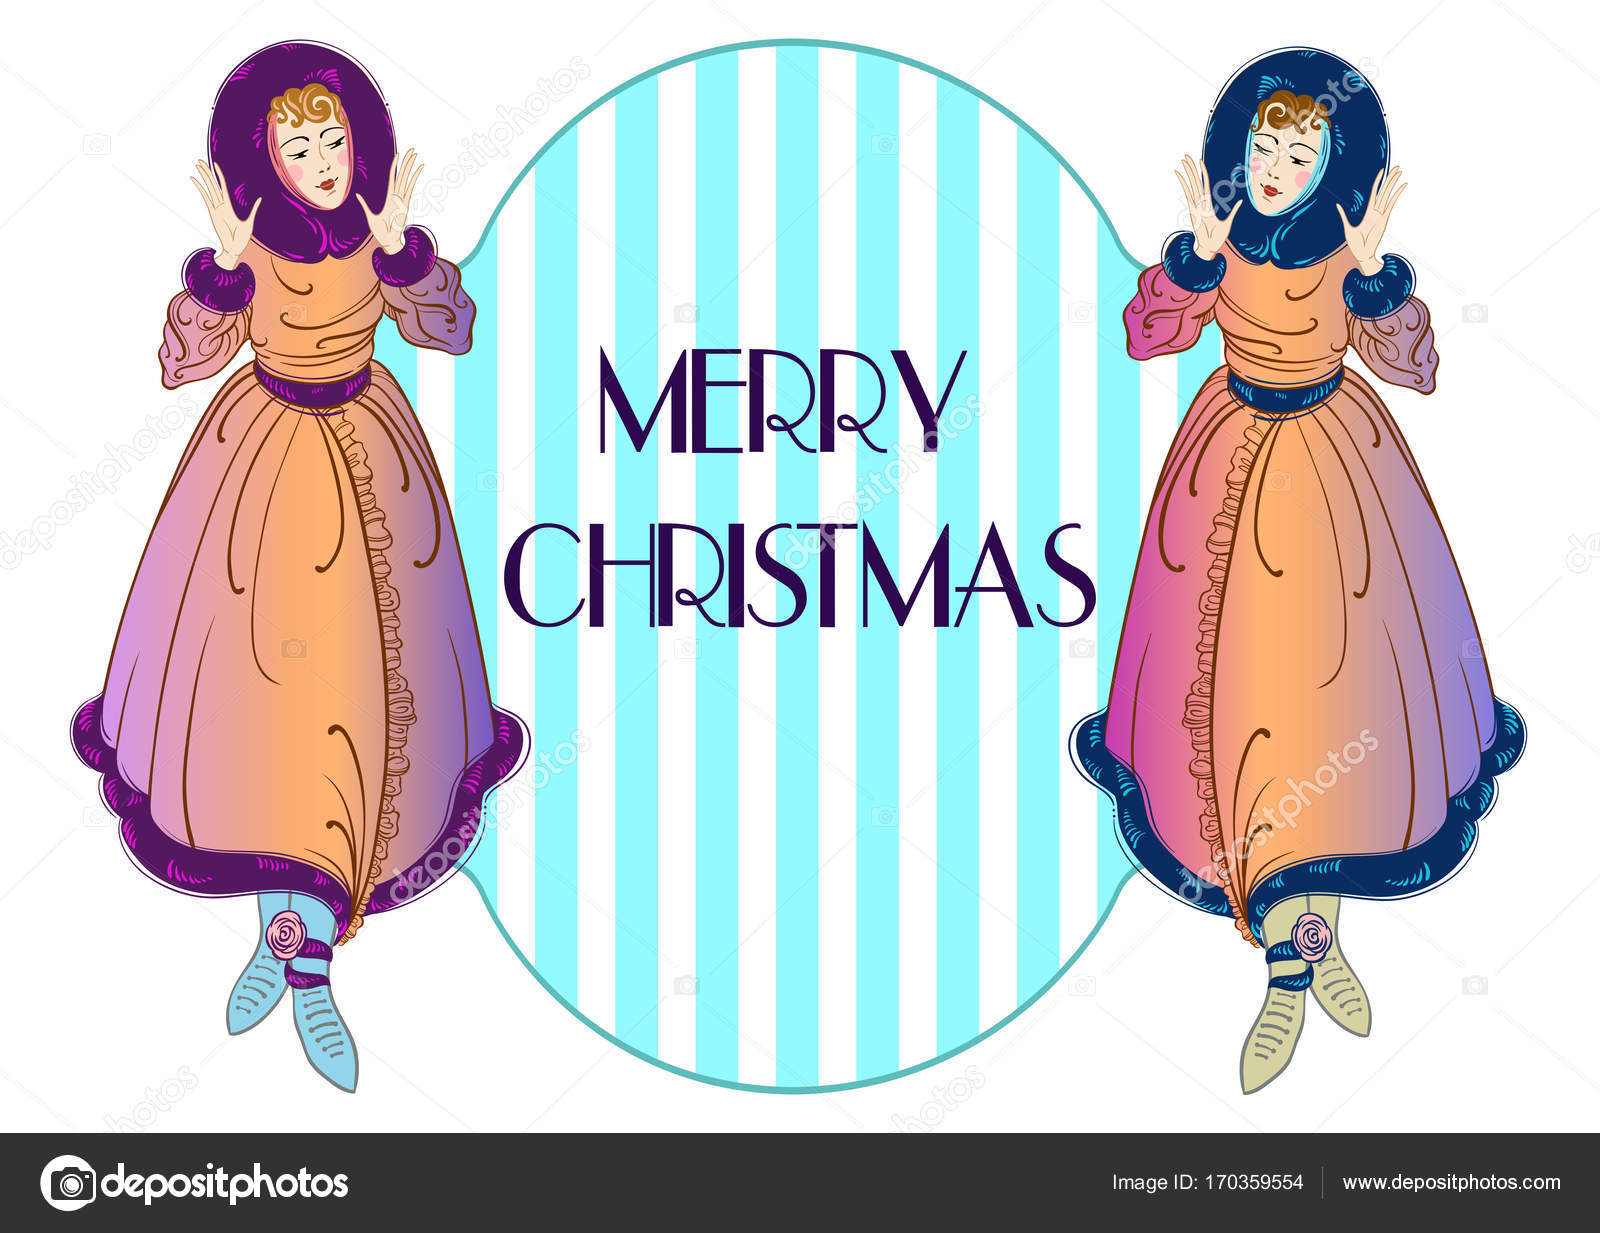 Vintage style Christmas invitation design with beautiful ladies ...